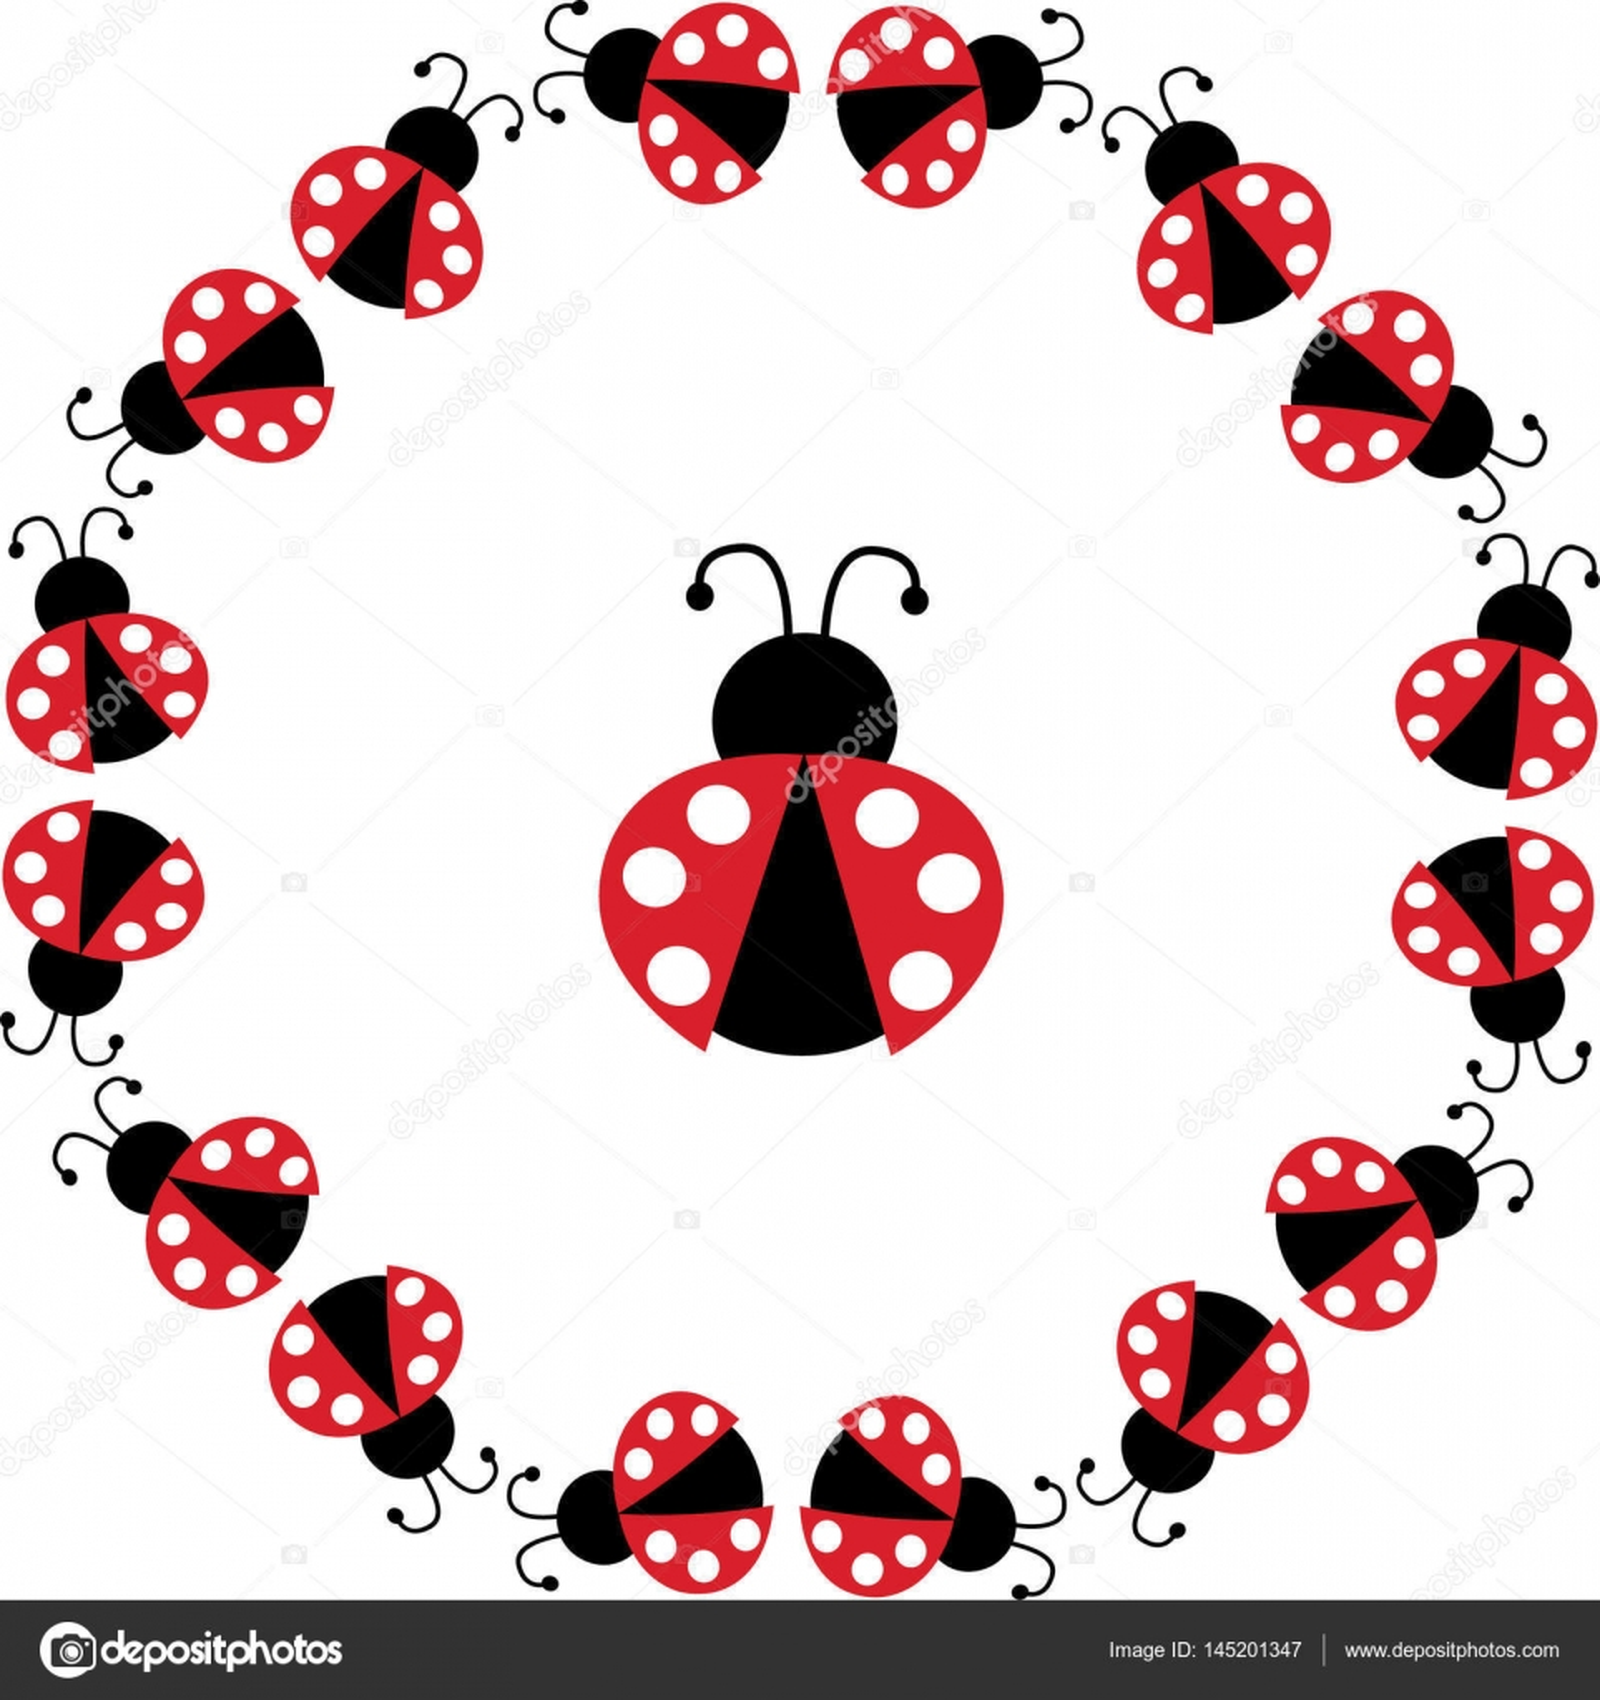 ladybug circle frame — Stock Vector © scrapster #145201347